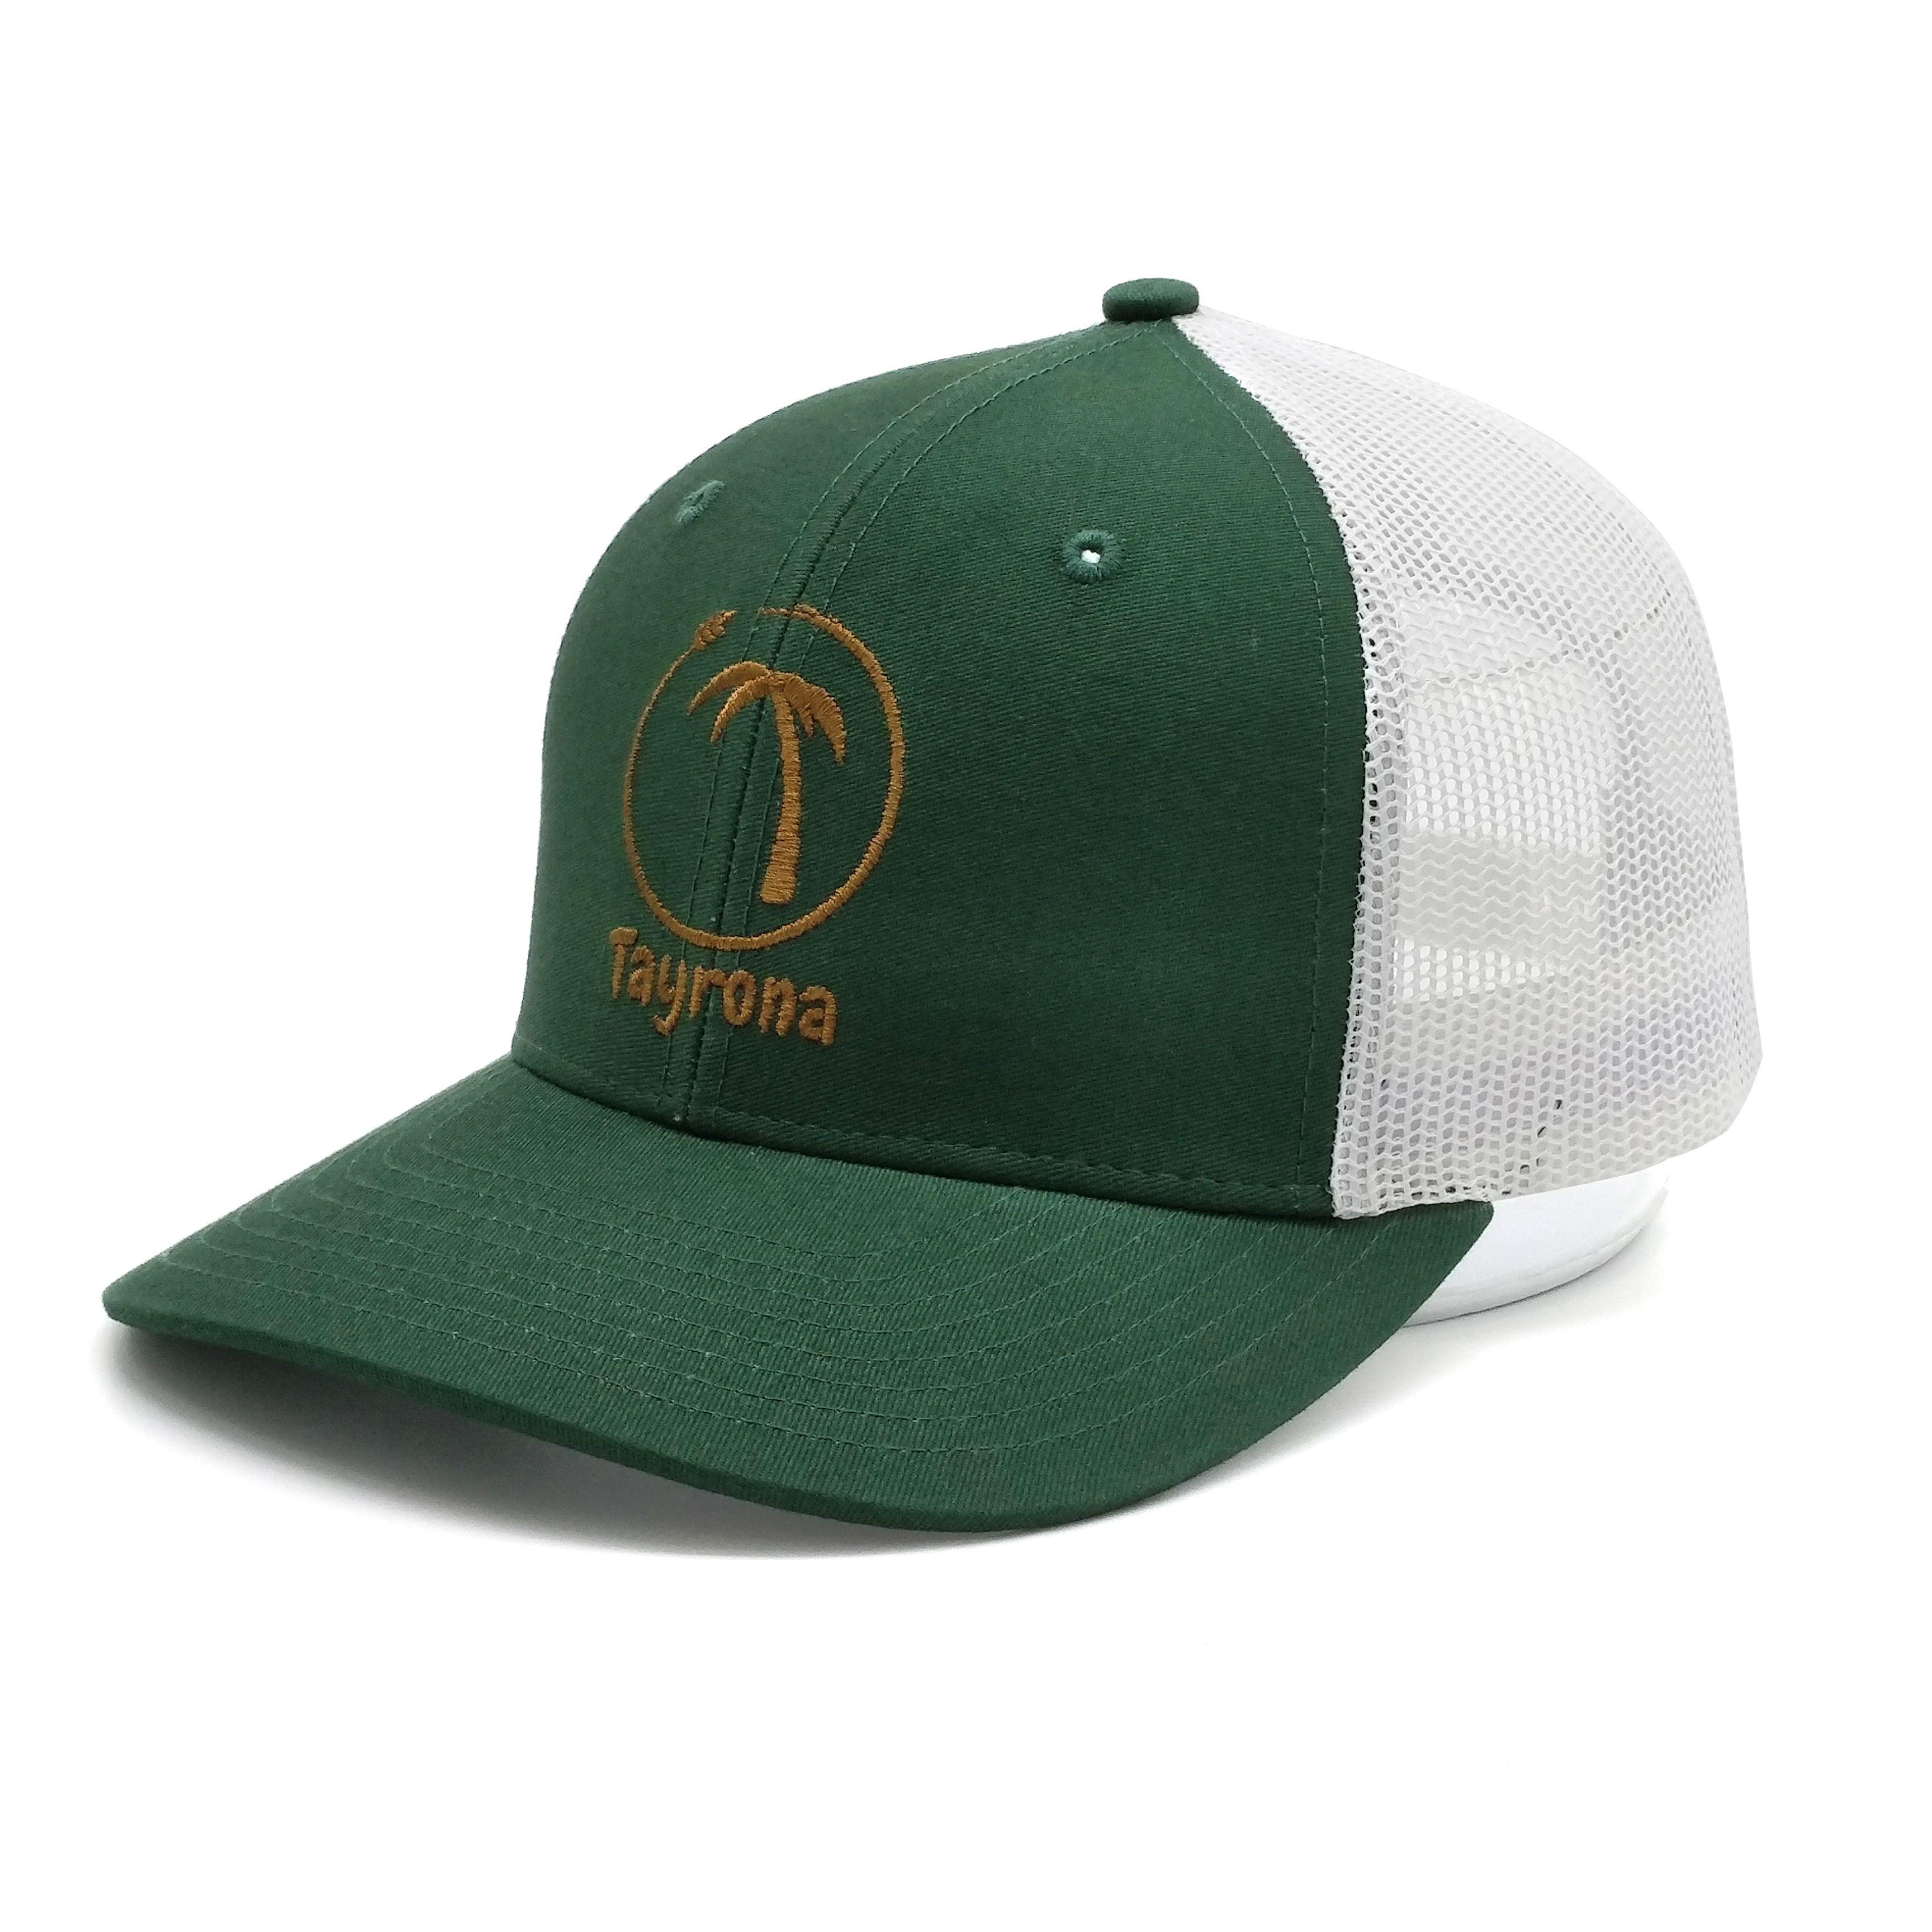 Tayrona Snapback Hat Green Hats Snapback Hats Hats